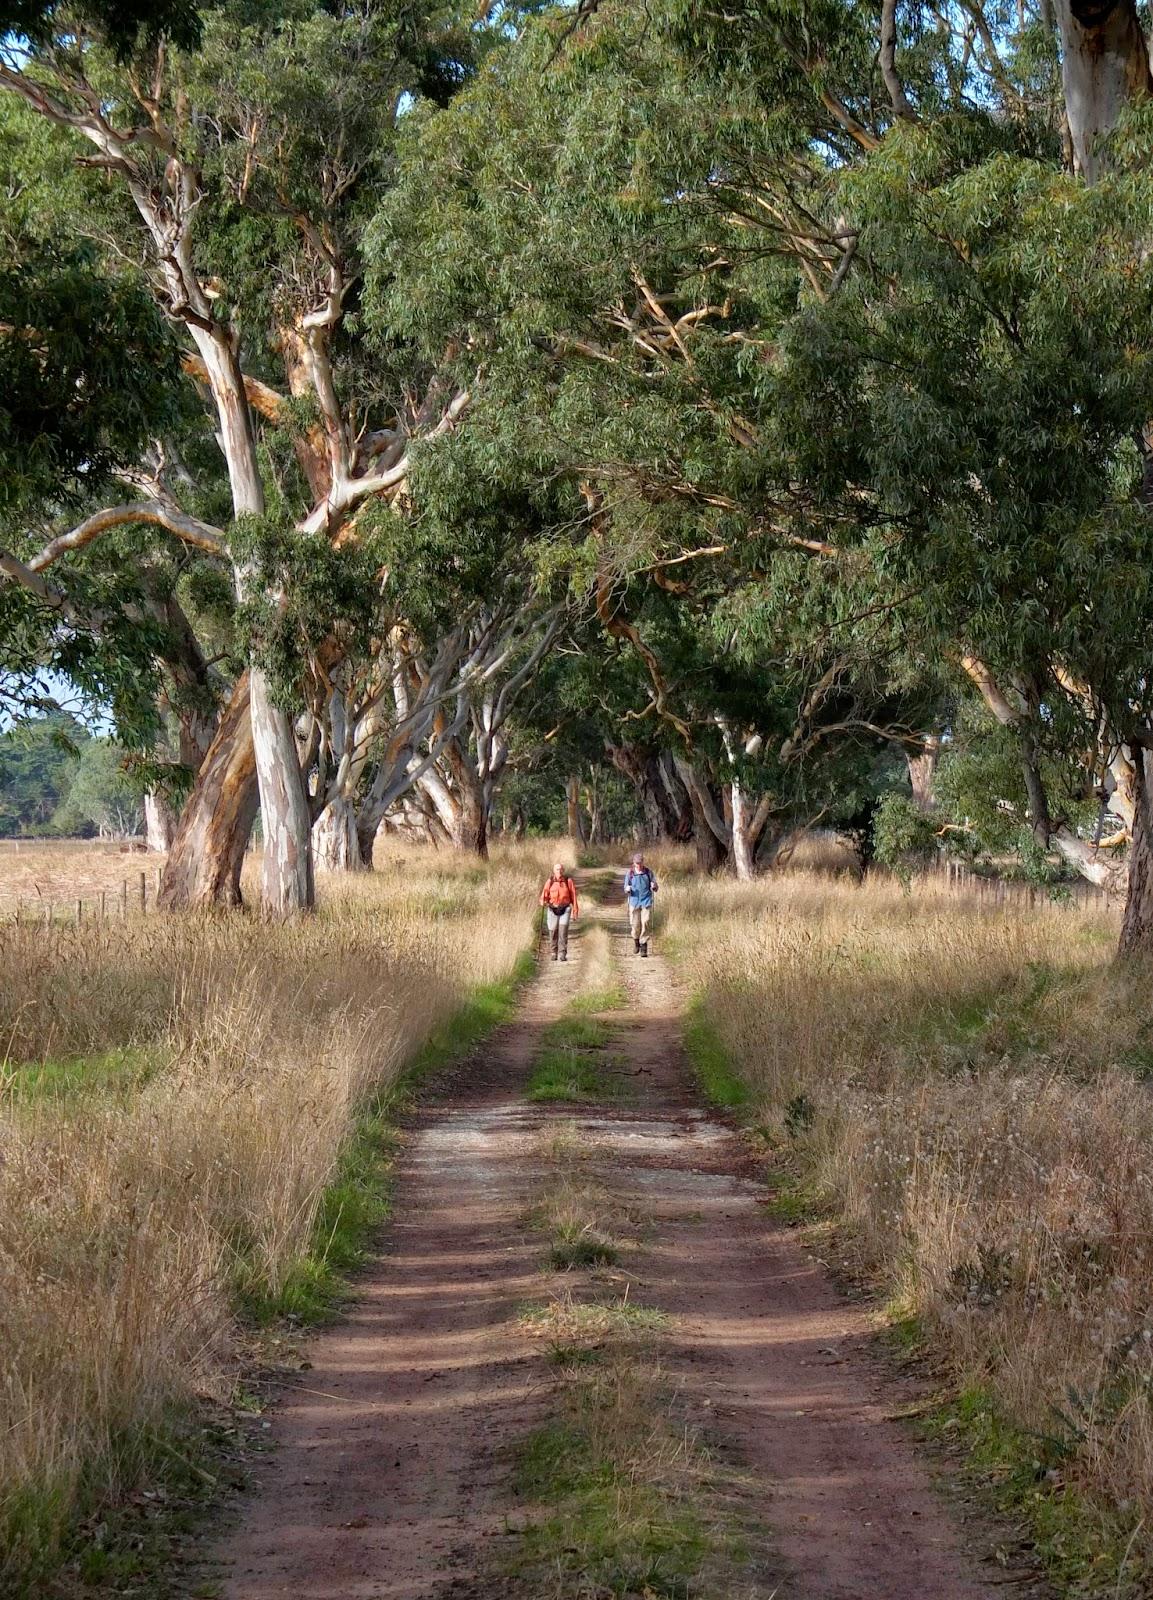 Camino Australia: Walking the Aussie Camino 2014